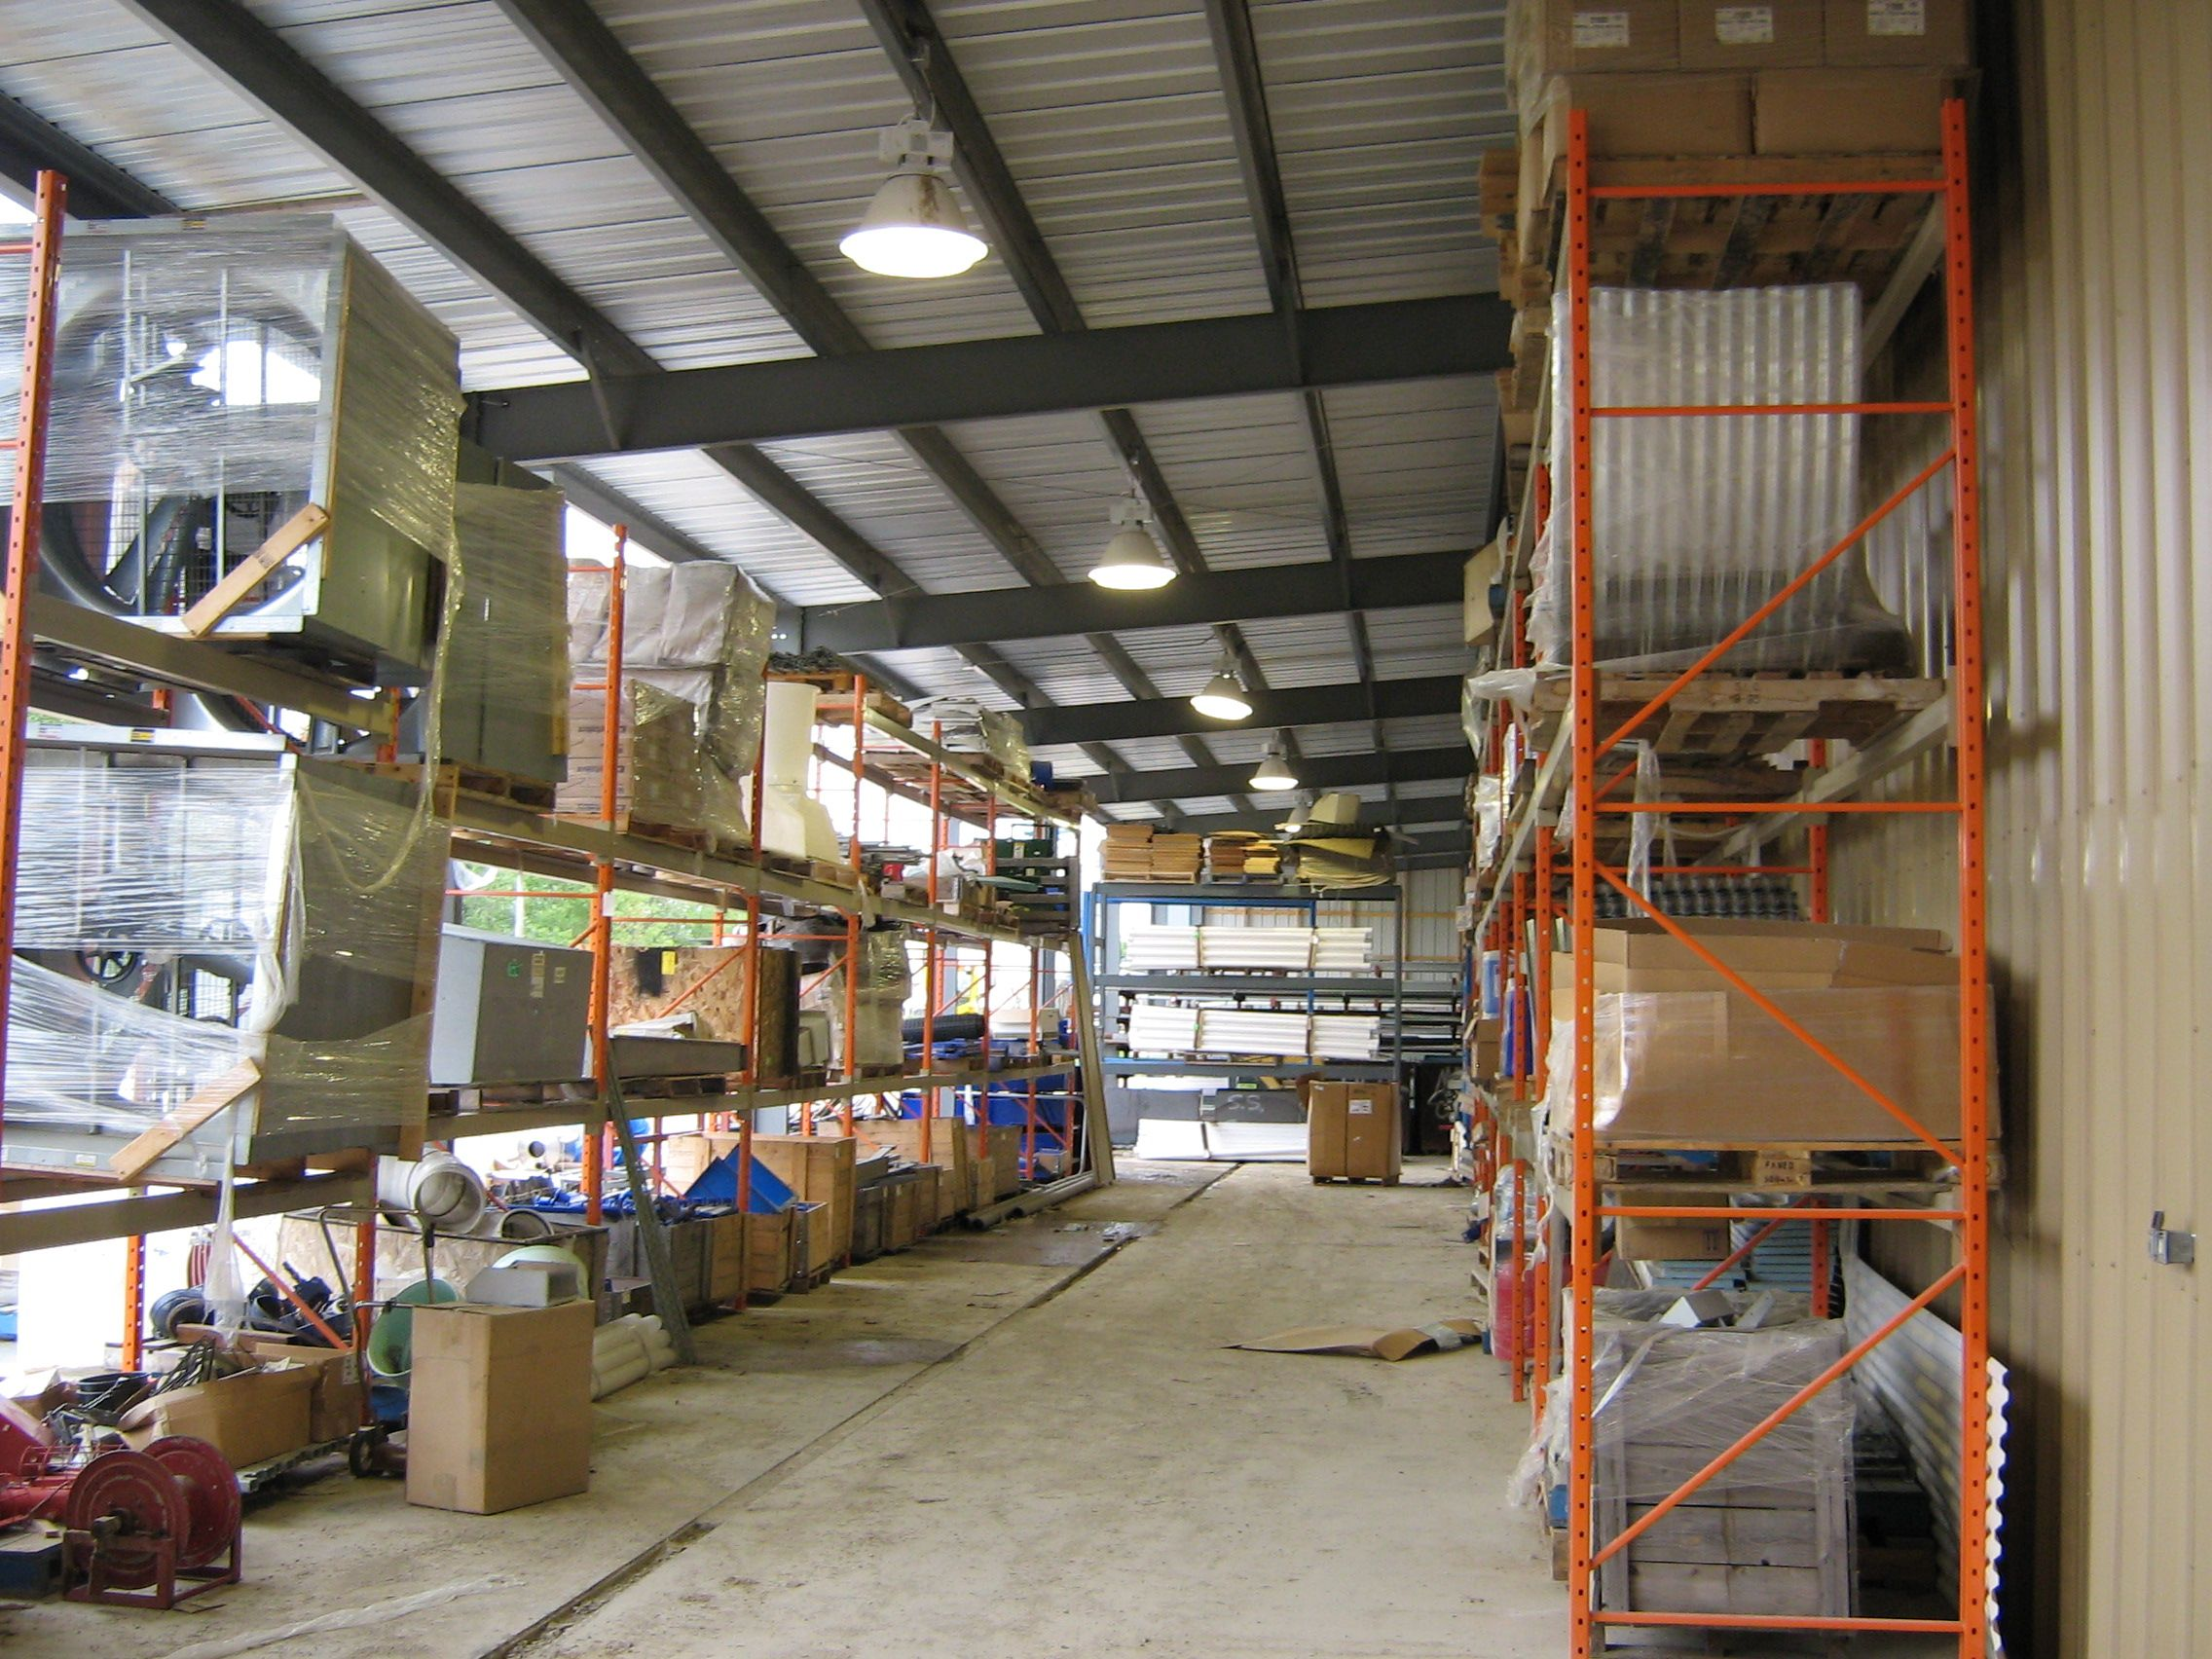 Warehouse-3.jpg (2272×1704)